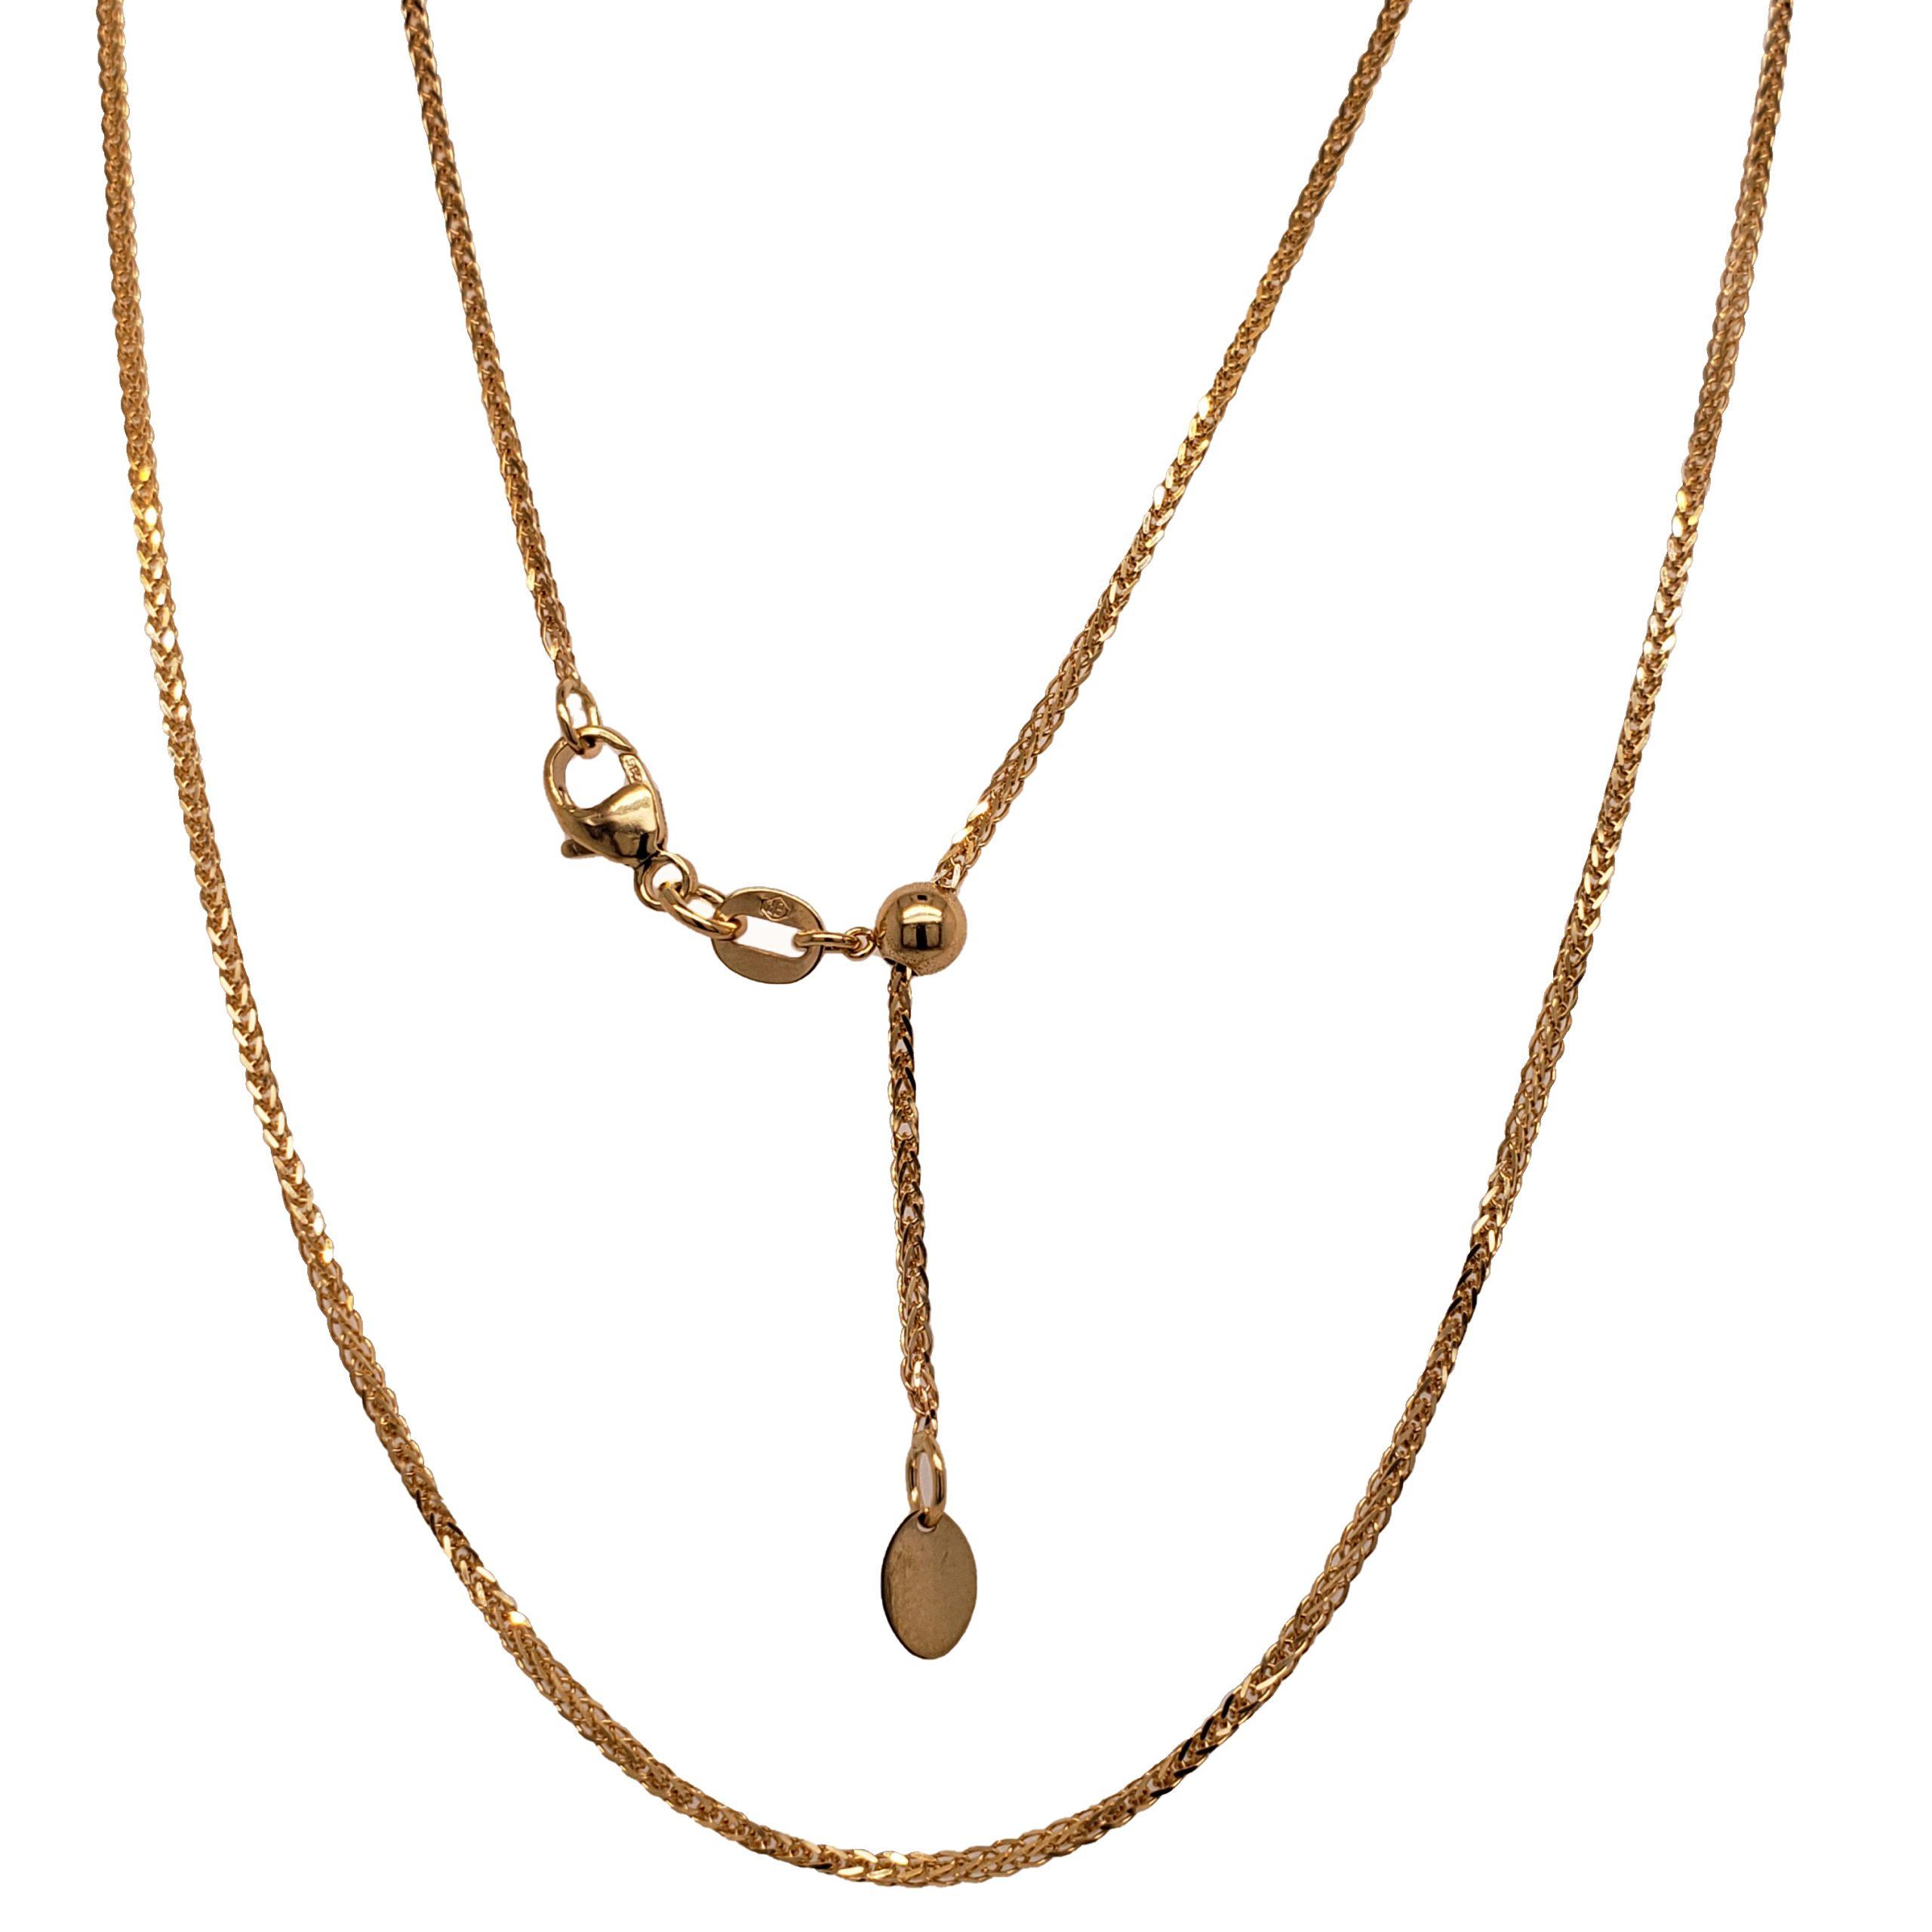 Adjustable Gold Chain